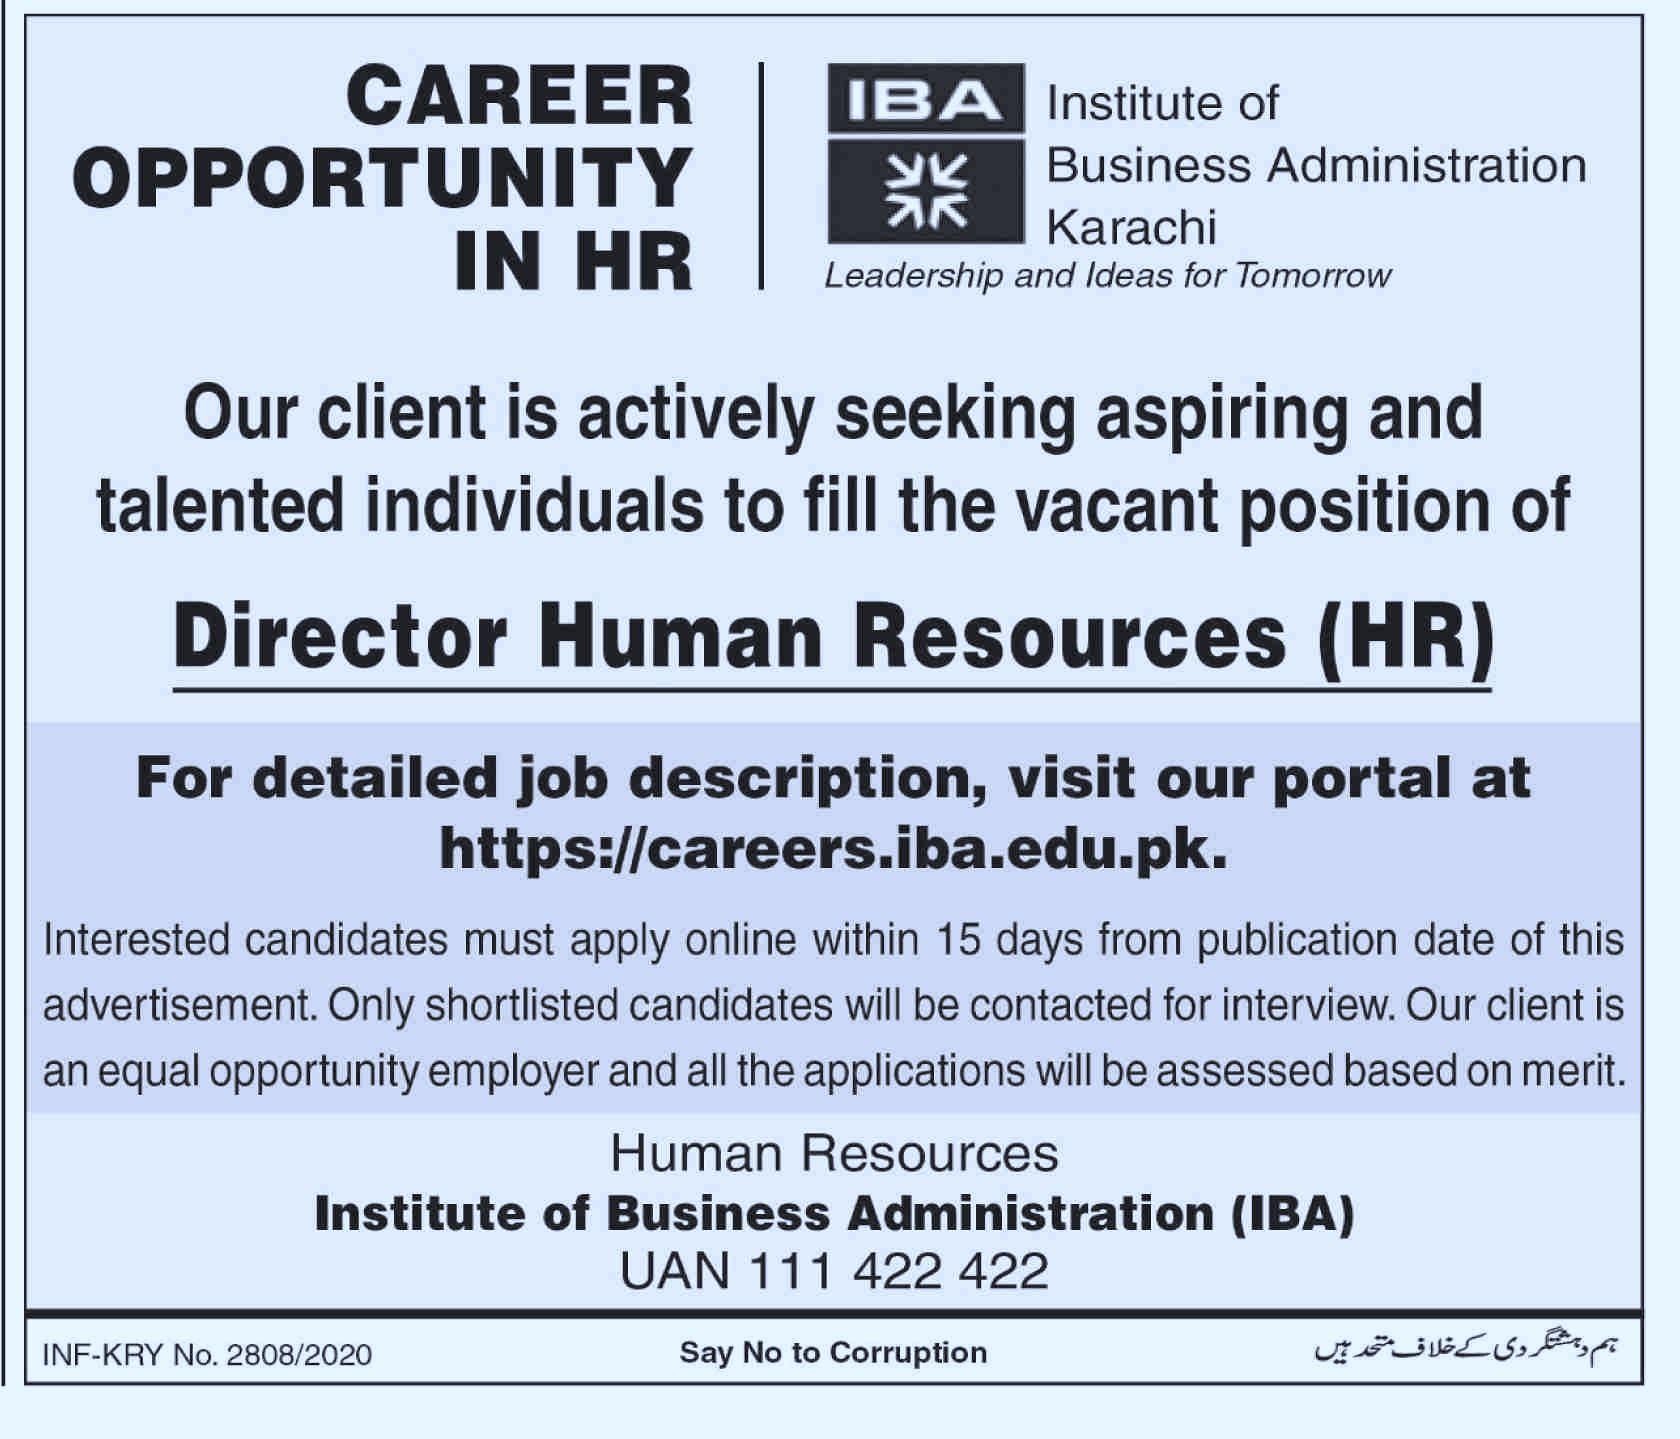 Institute Of Business Administration IBA Jobs in Pakistan - Apply Online - careers.iba.edu.pk